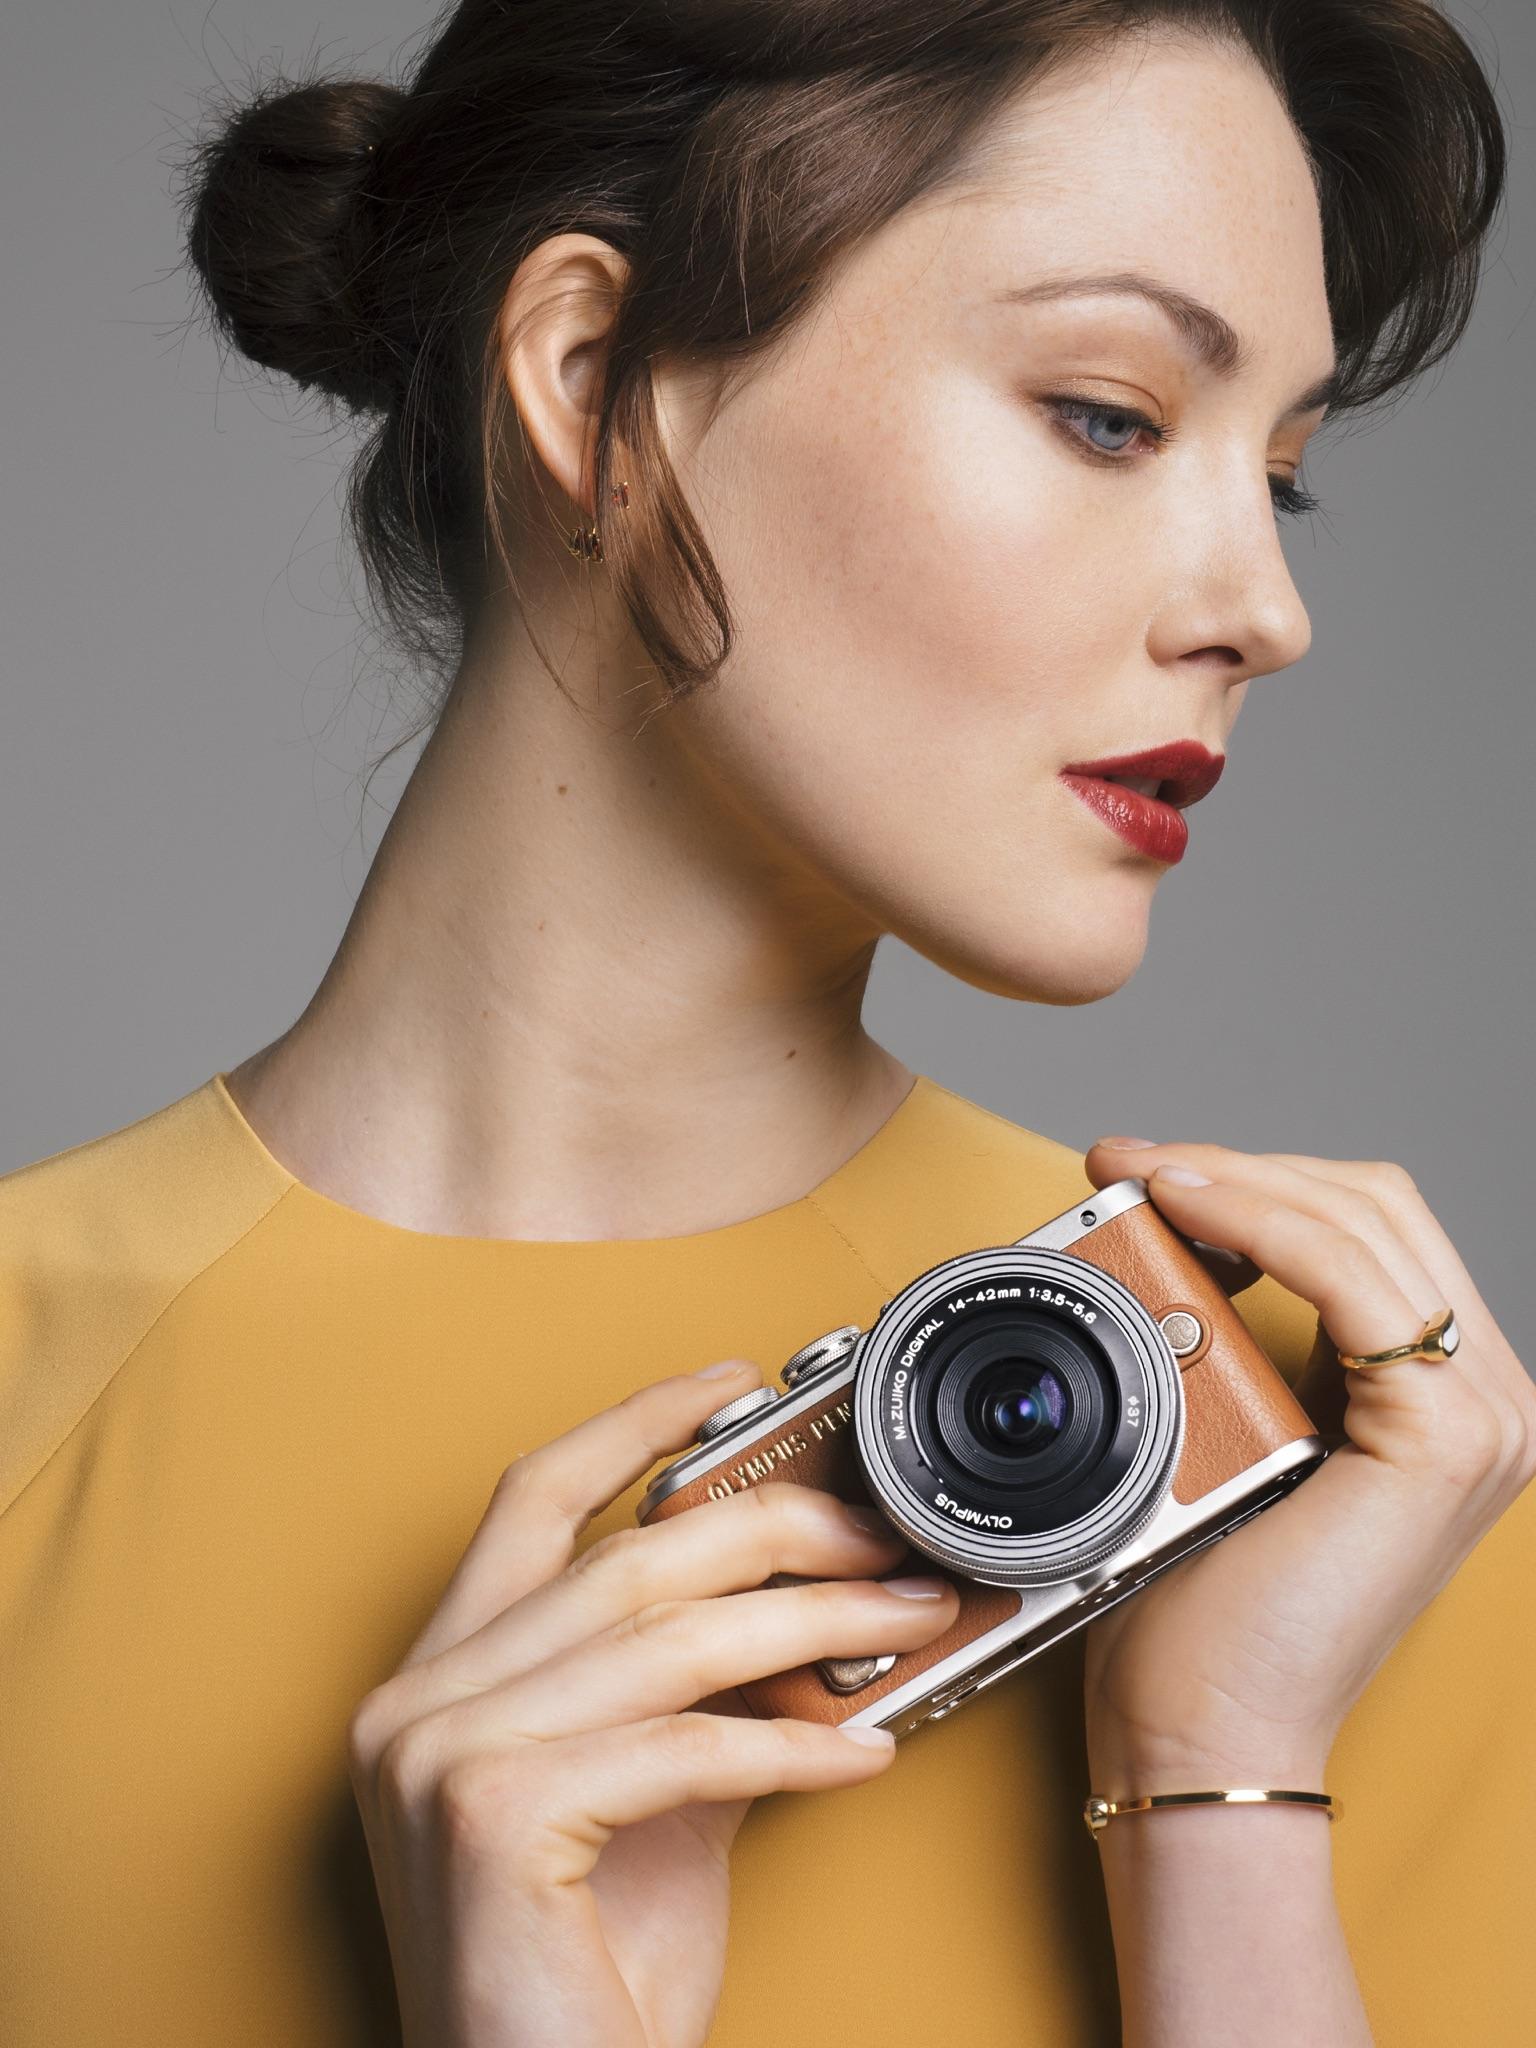 Olympus PEN E-PL8 Fashion Accessories Campaign Photoshoot Martine Lervik